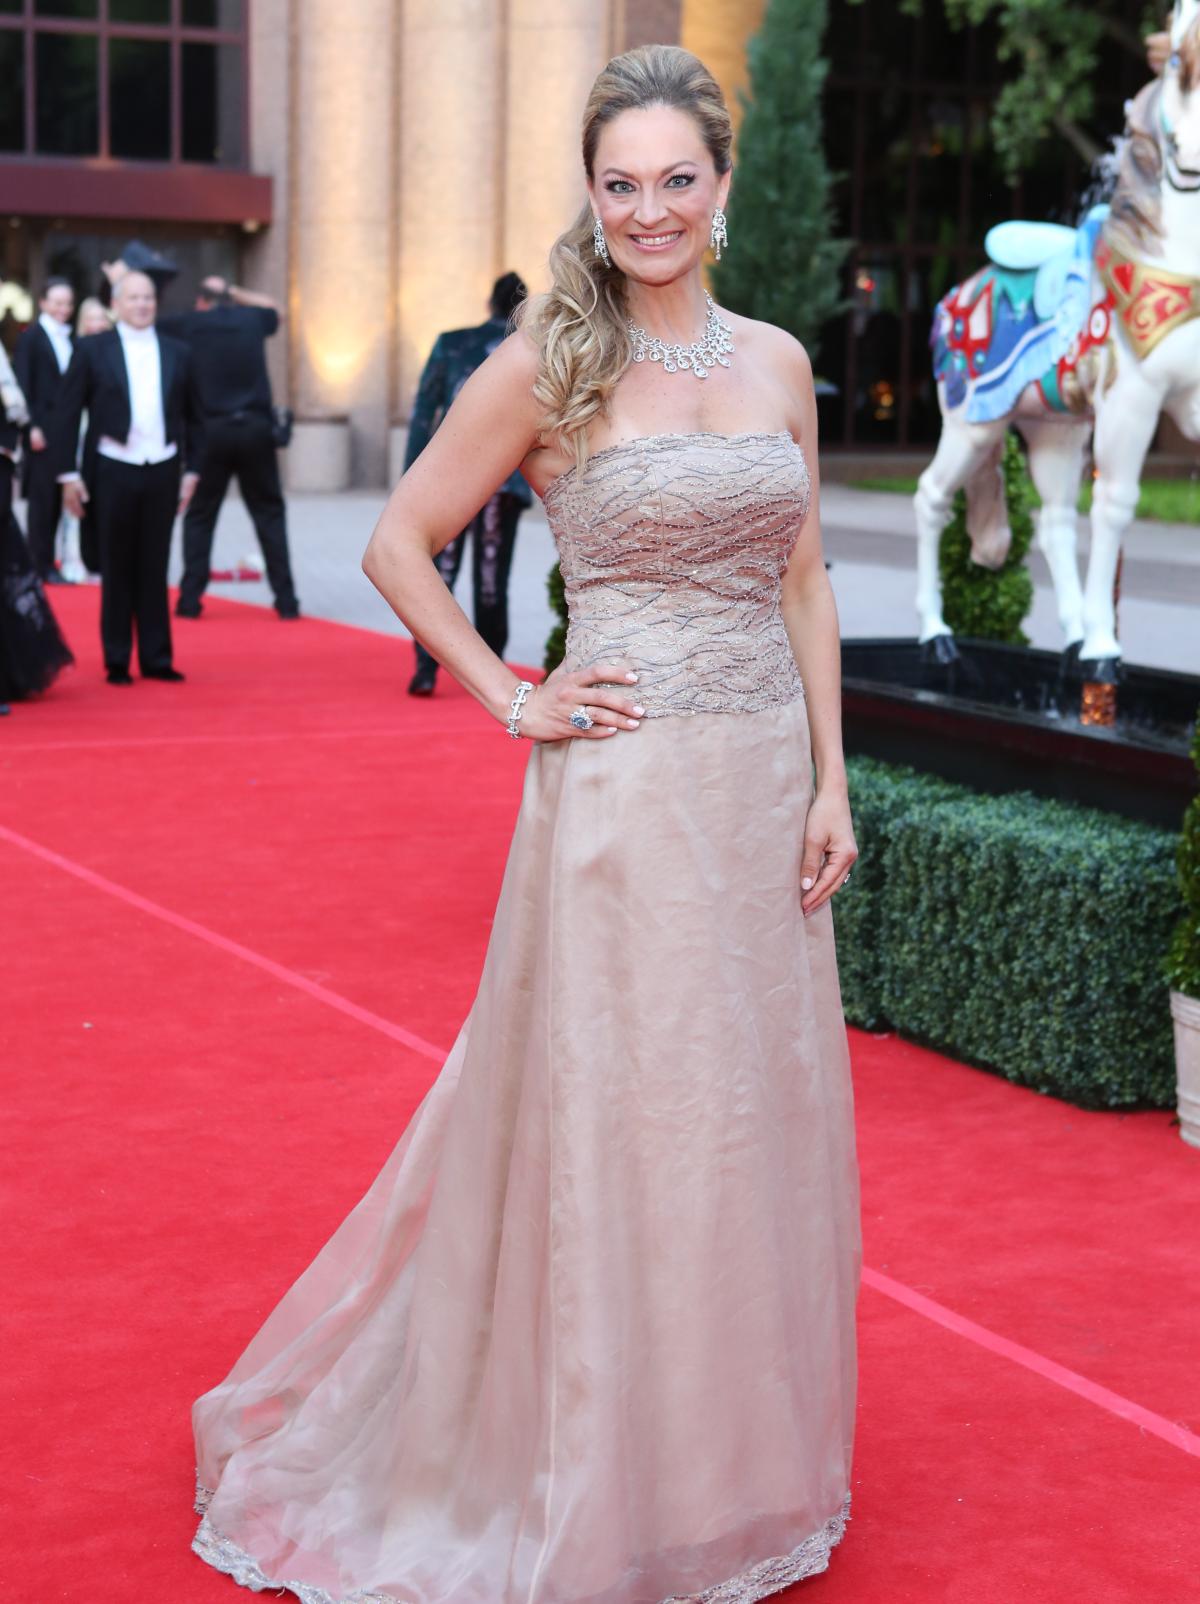 Houston, Opera Ball Gowns, April 2016,  Rachel Regan in Crisada from Neiman Marcus.